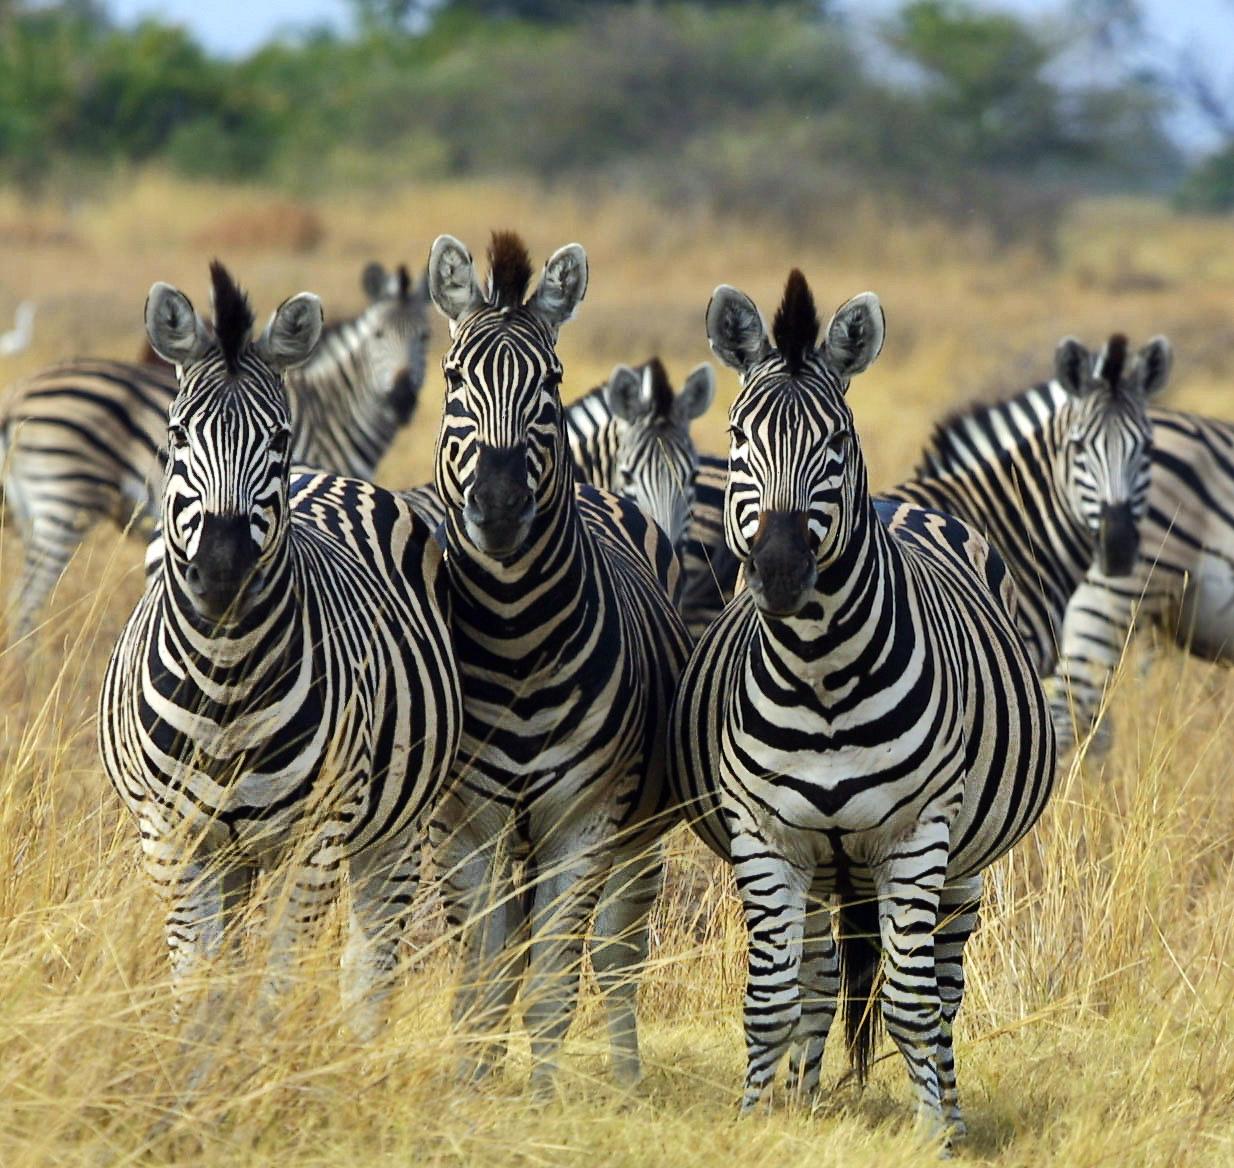 Zebra. Photo credit: Paul Maritz. https://commons.wikimedia.org/wiki/File:Zebra_Botswana_edit02.jpg